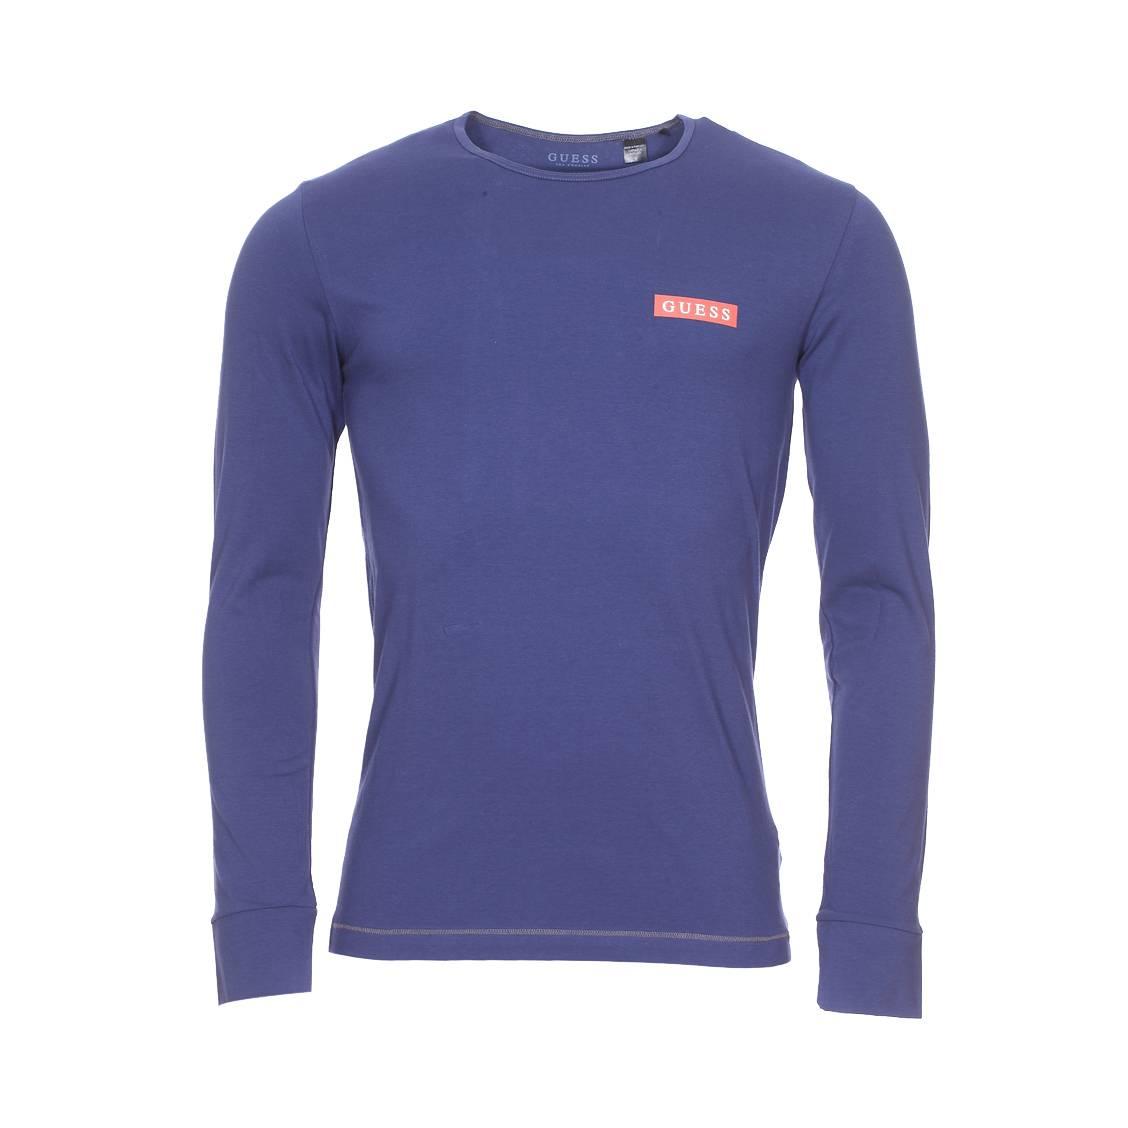 Tee-shirt col rond manches longues guess en coton stretch bleu indigo floqué